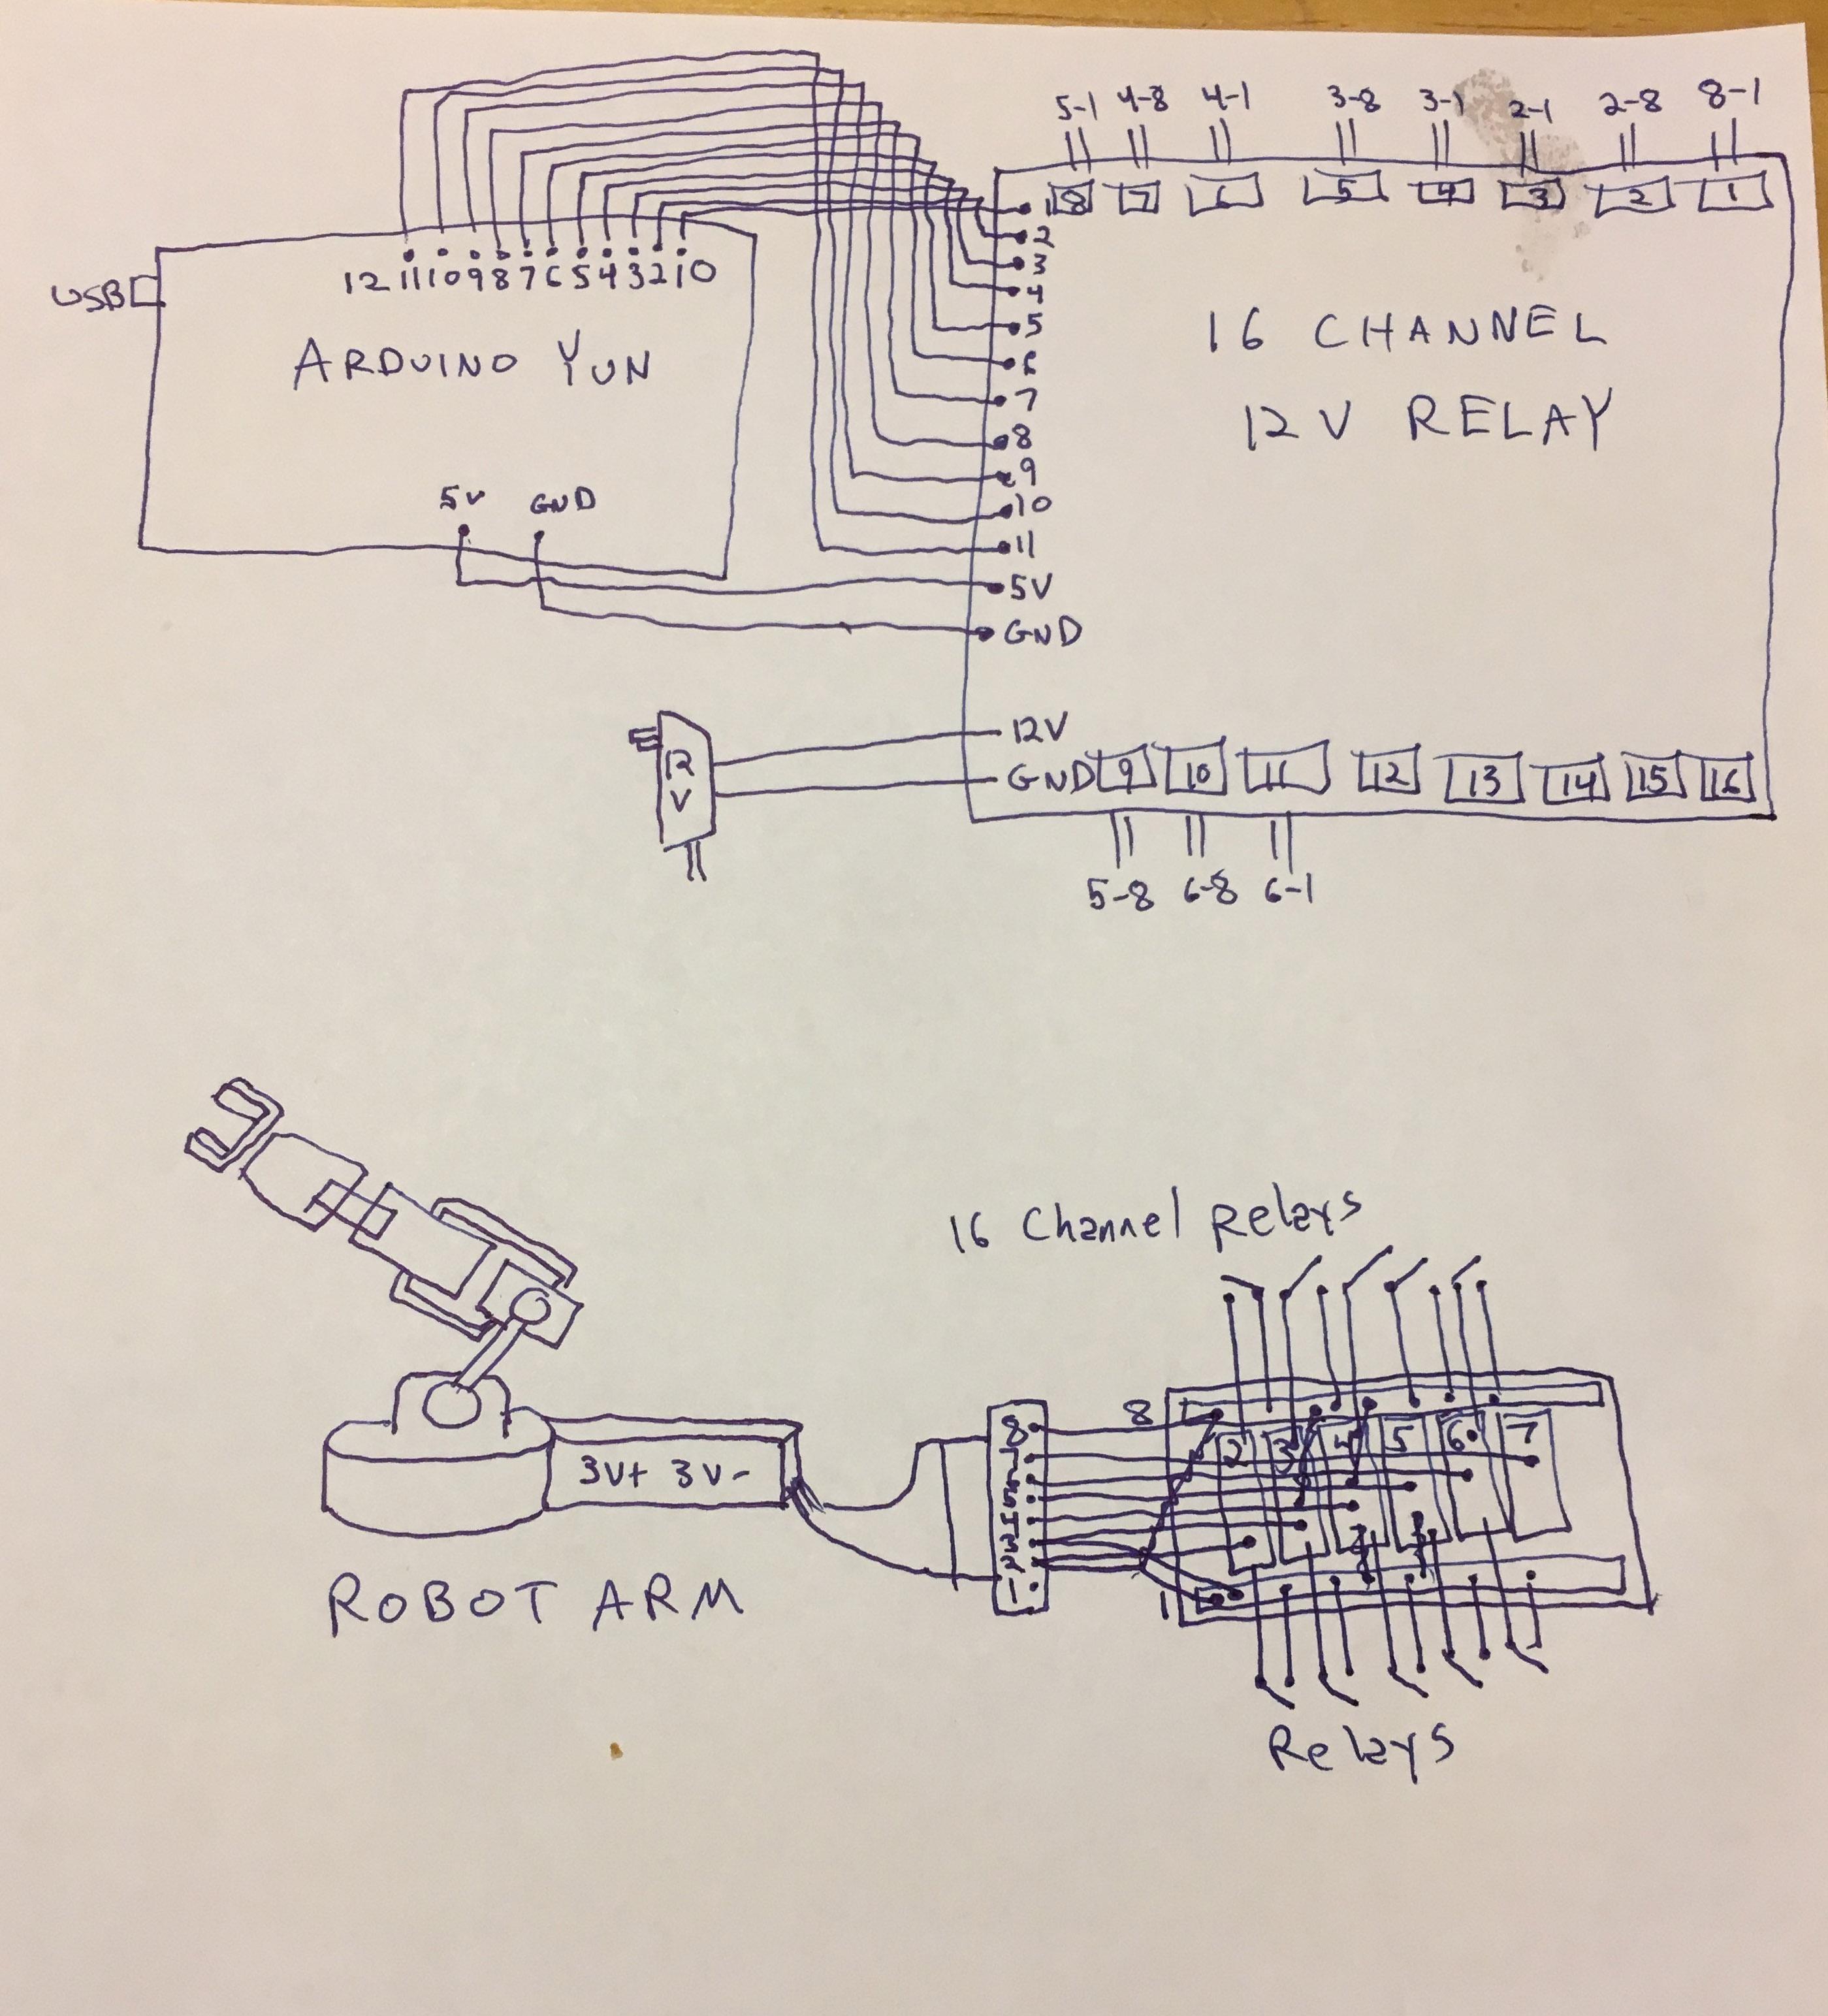 Alexa Robot Arm M1 M2 Wiring Diagram 3d9eu8asnu